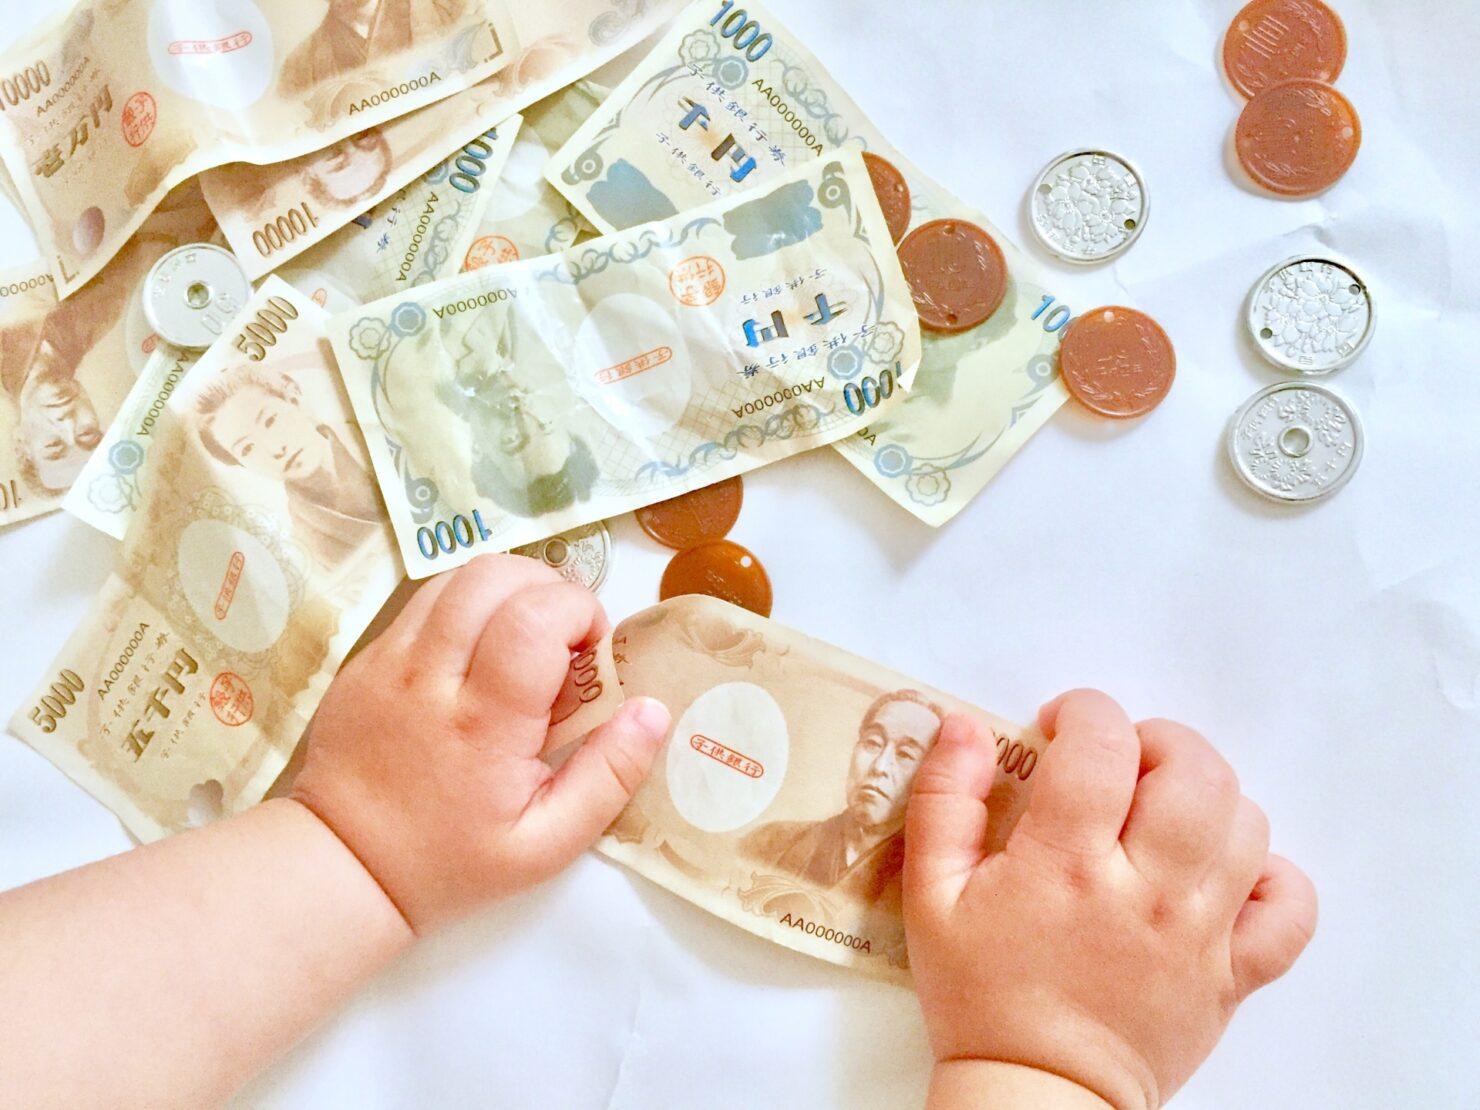 【FP監修】教育費はいくら貯めるべき? 大学までにかかる教育費の平均と準備方法